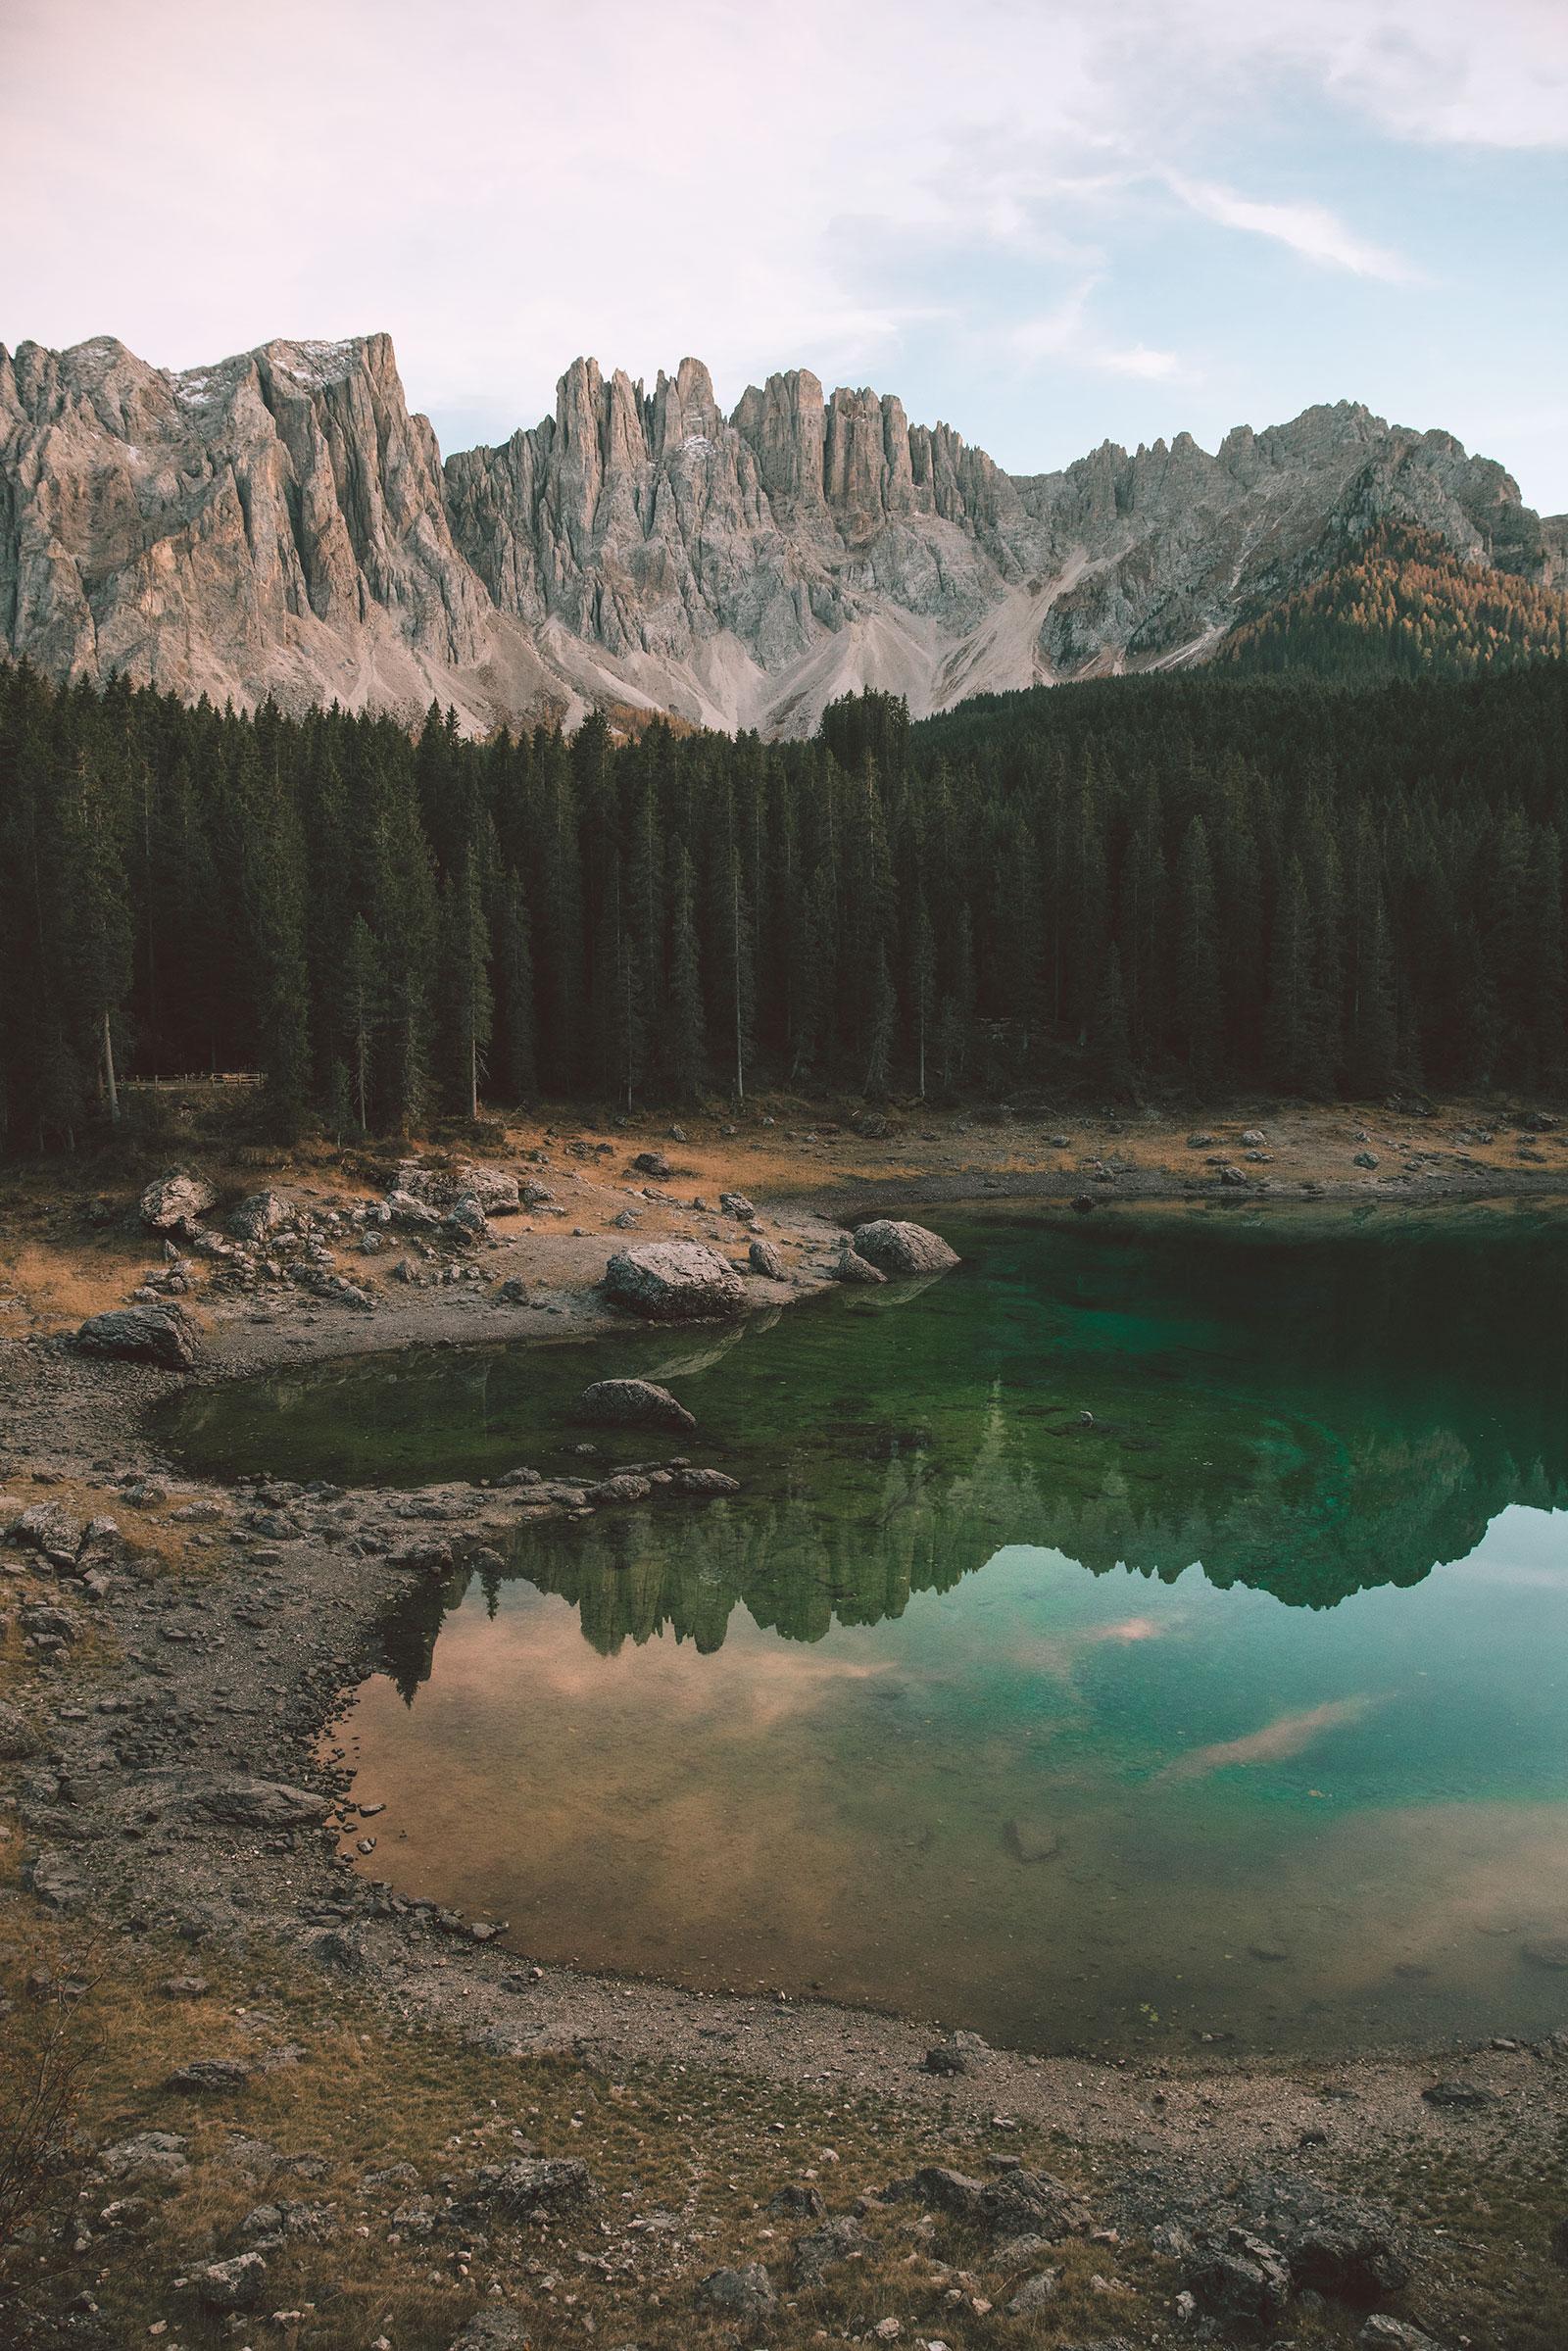 lago-di-carezza-lake-carezza-italy-the-dolomites-sunset-blue-water-october-2017.jpg